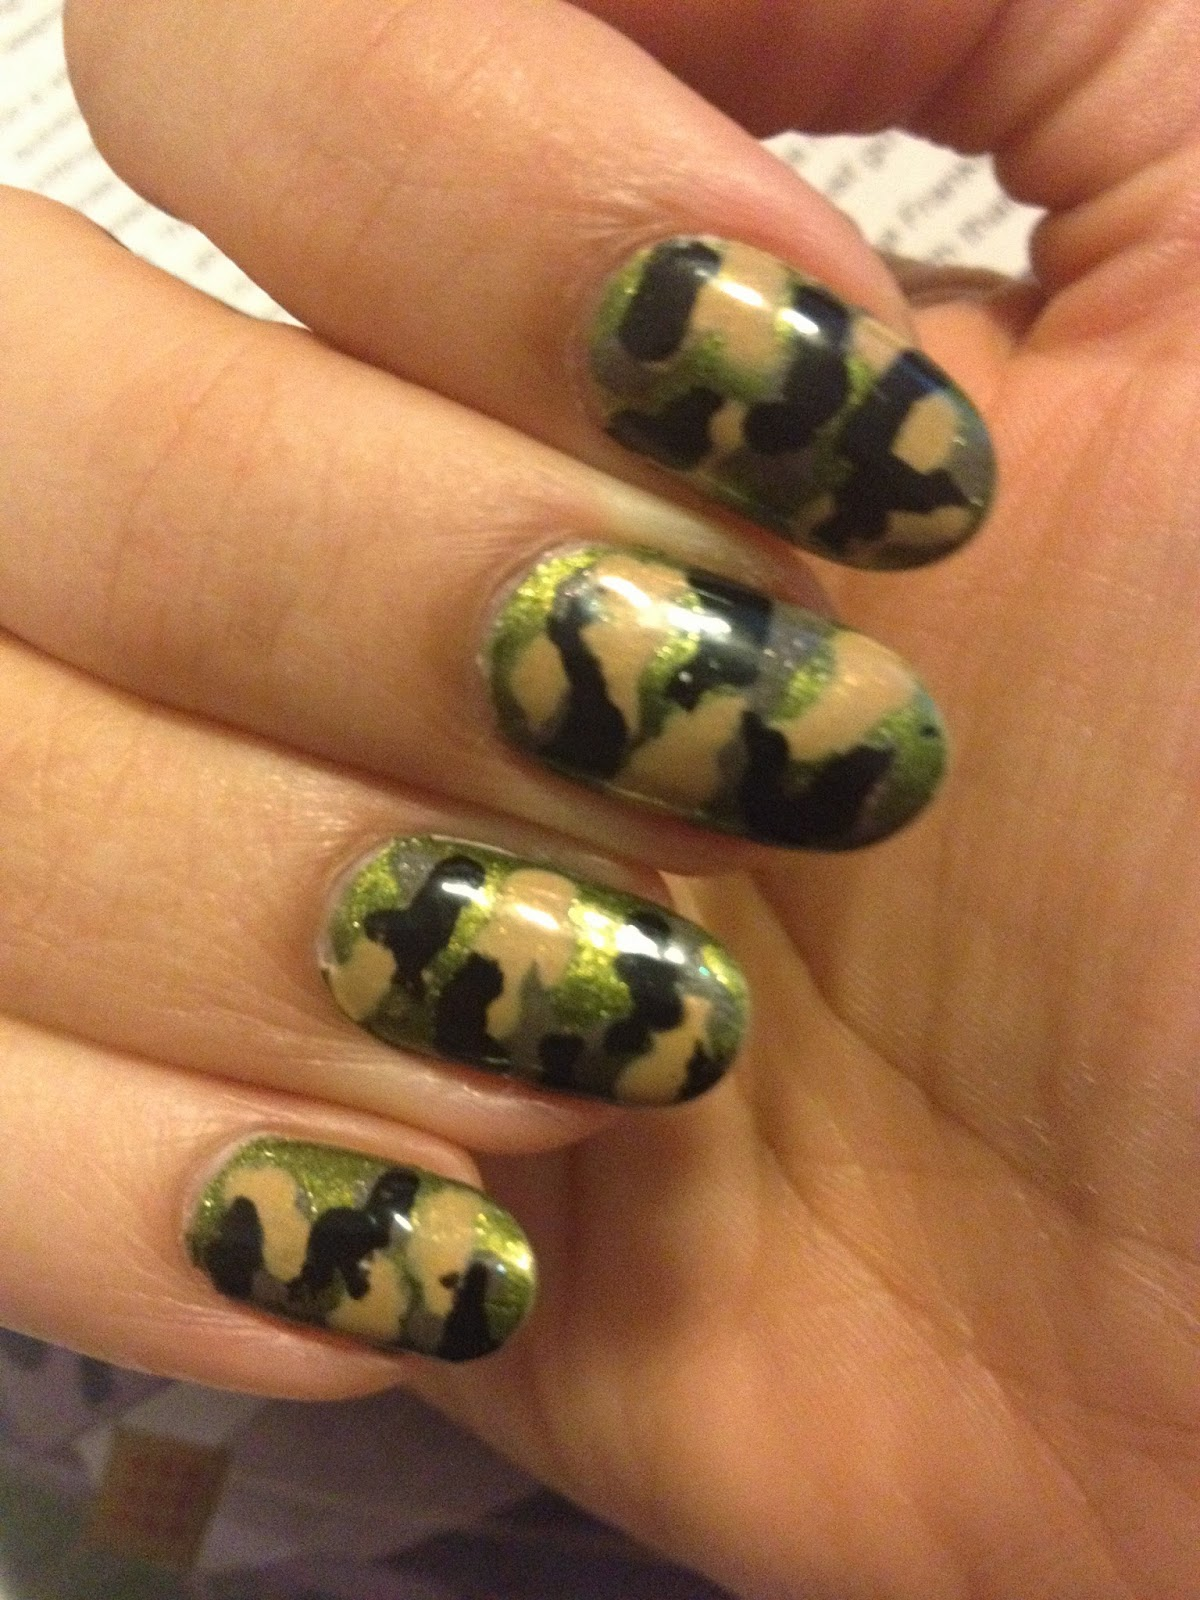 Supurrstarr Nails: Nail Art Spam 2